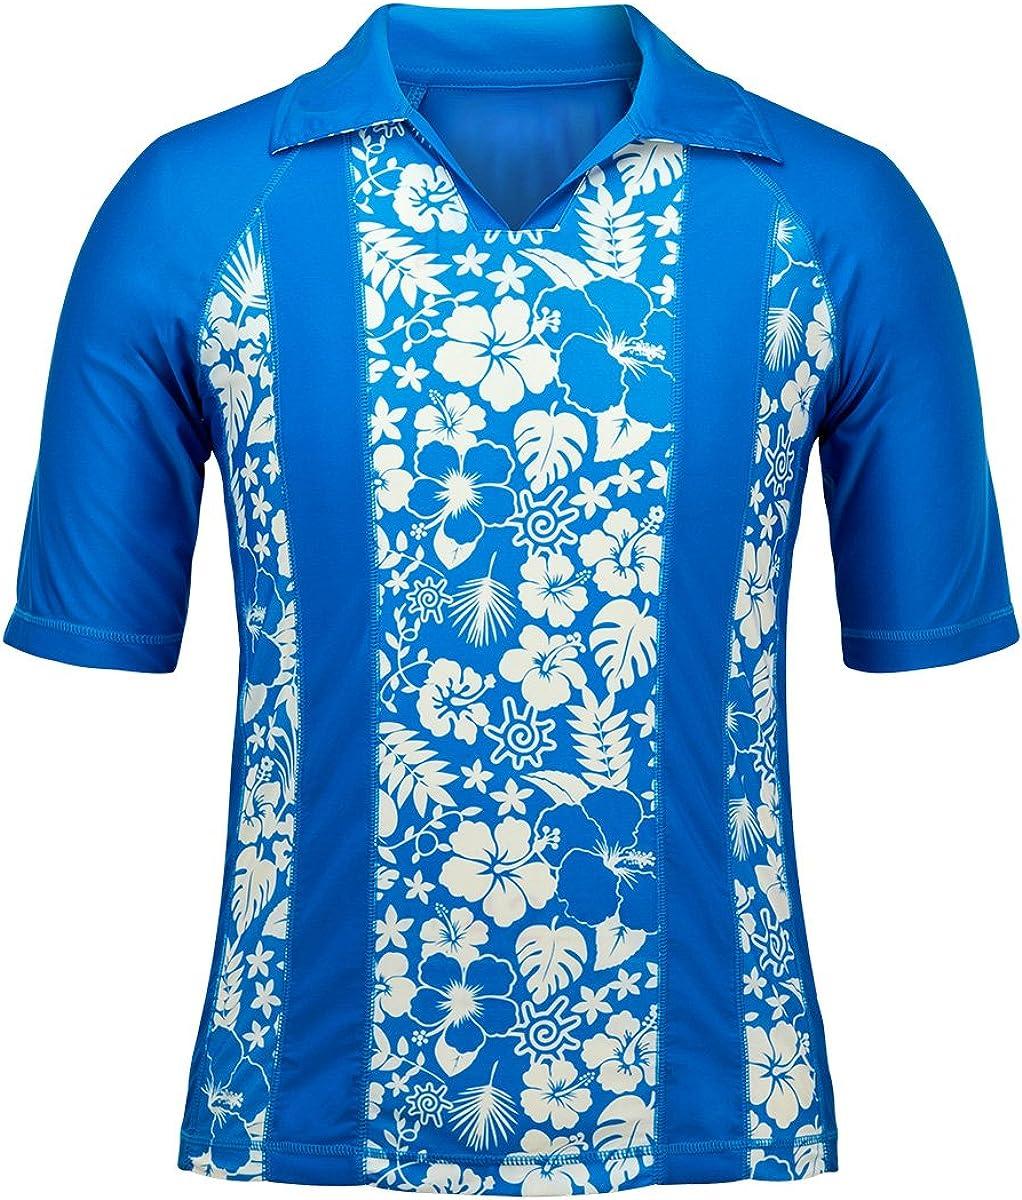 UV SKINZ UPF 50+ Men's V-Neck Aloha Sun & Swim Shirt